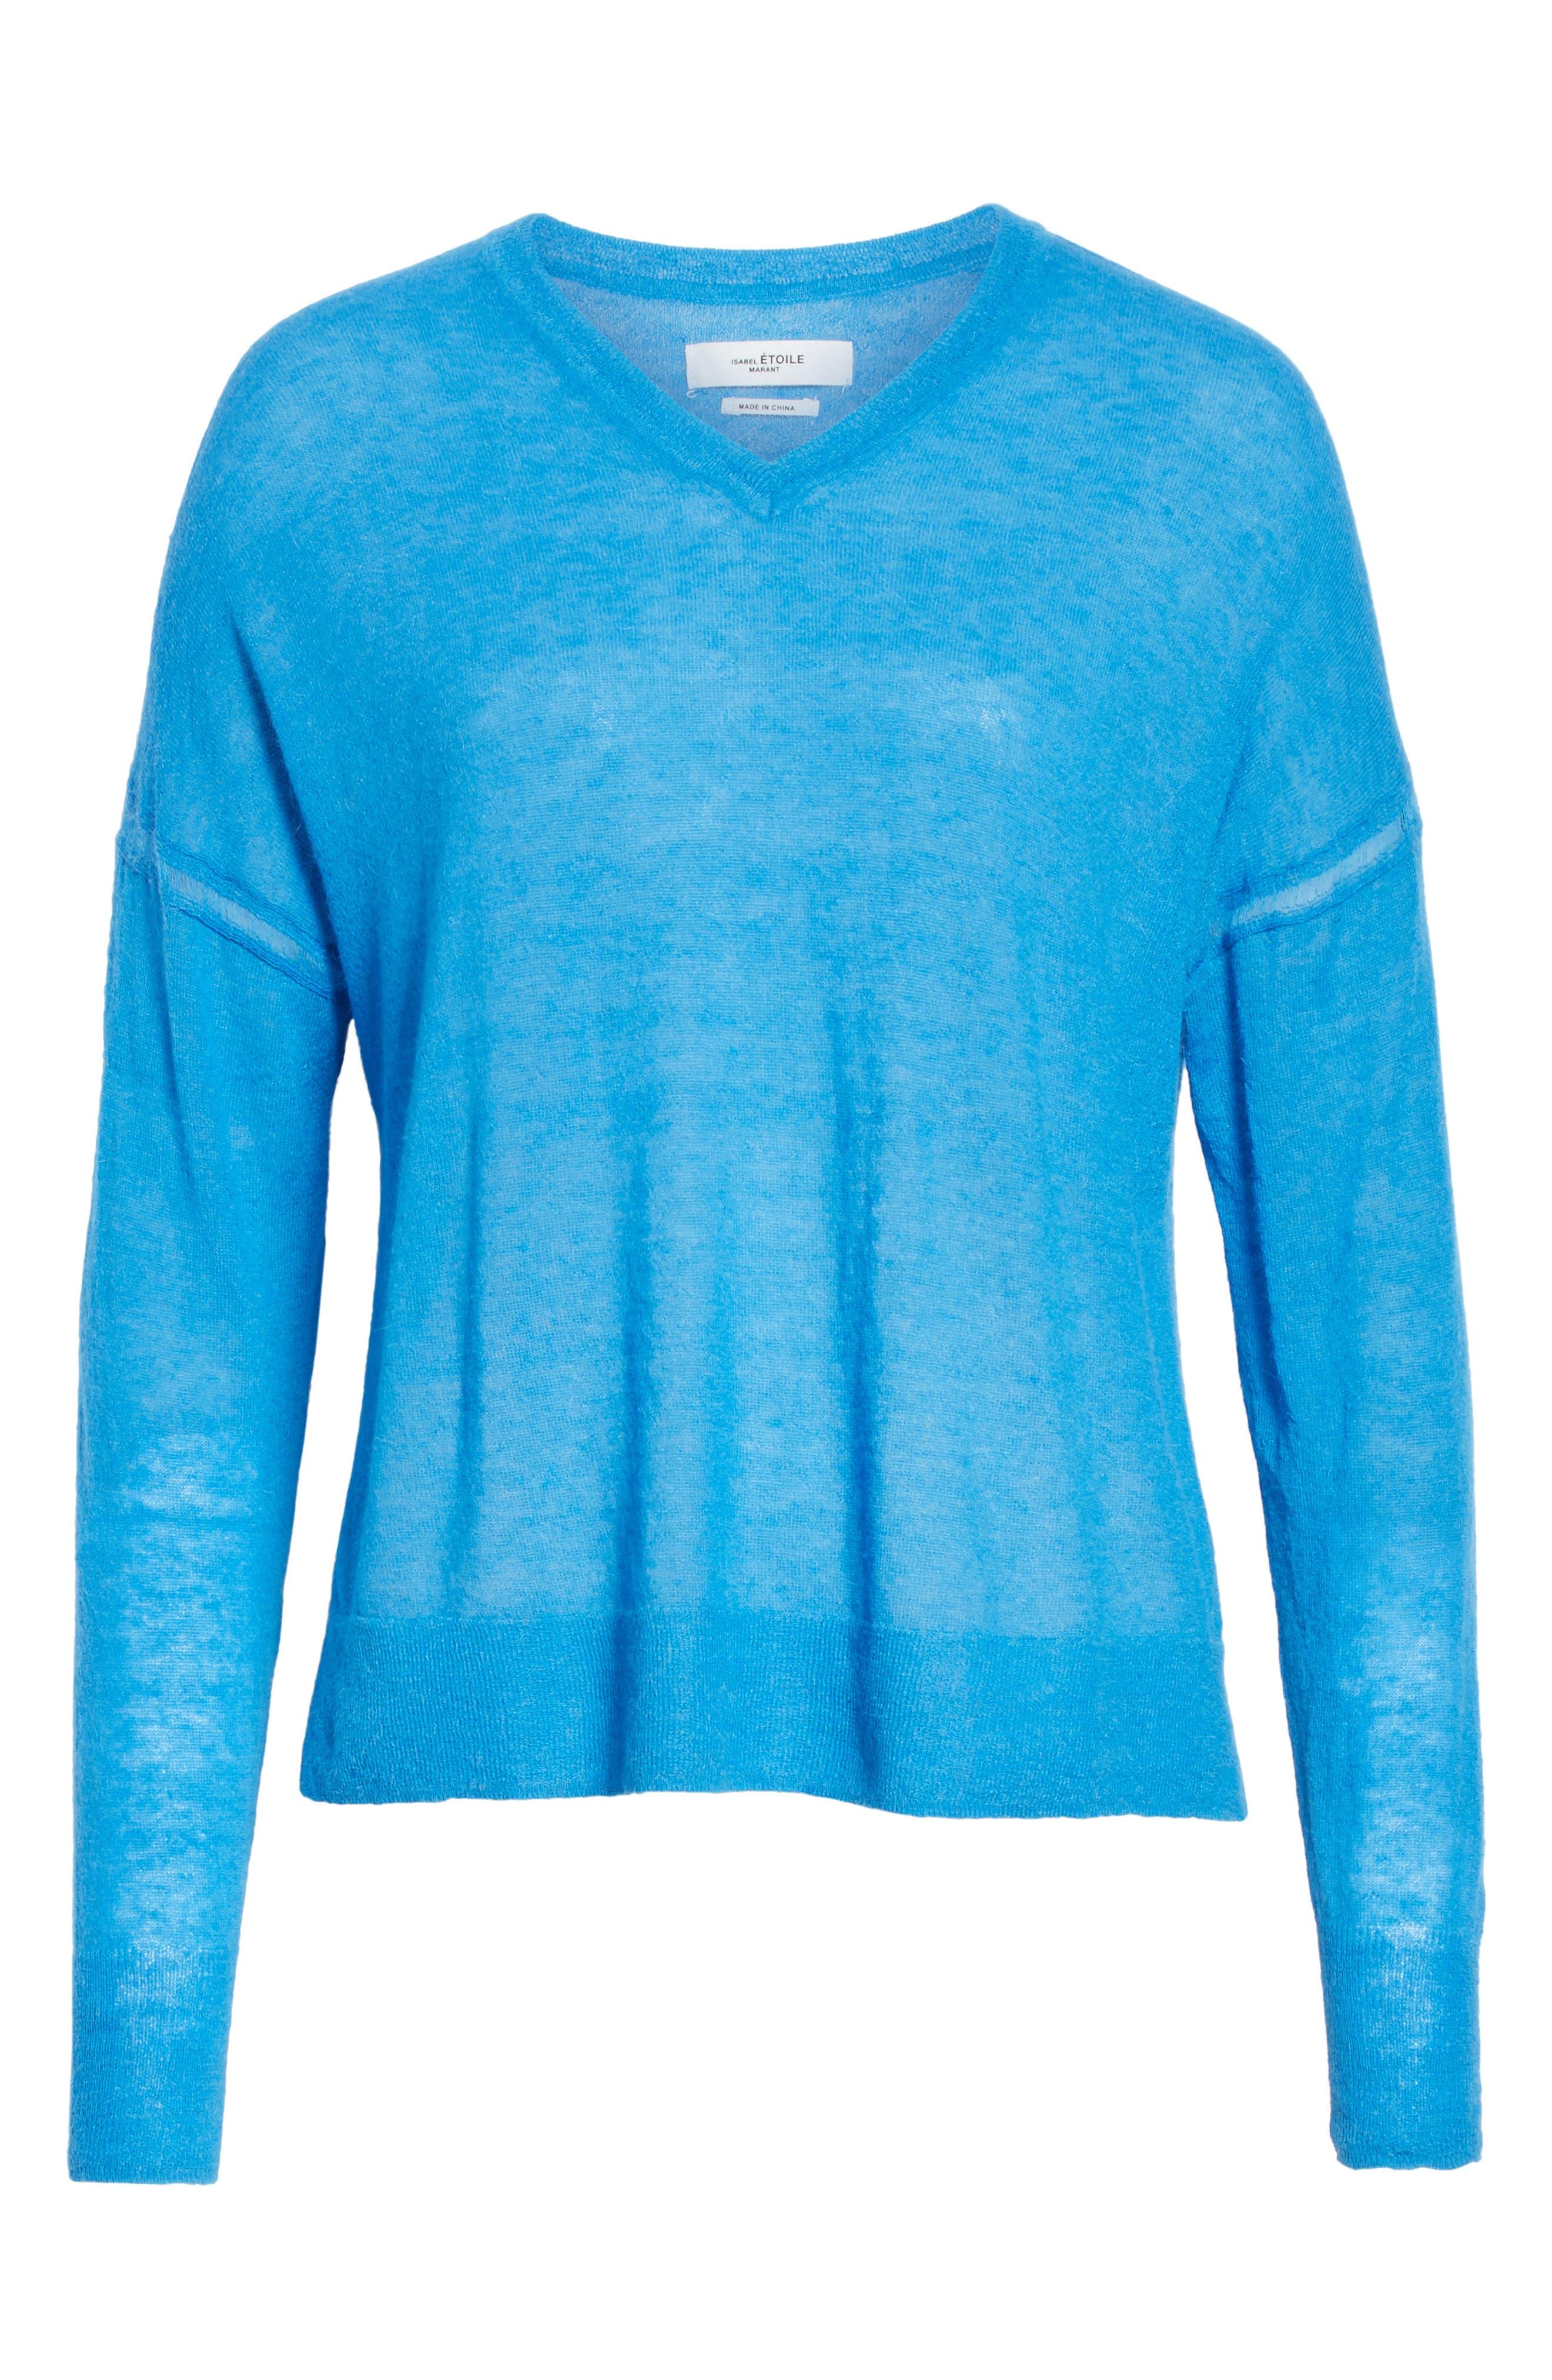 Isabel Marant Étoile Wool & Alpaca Blend Sweater,                             Alternate thumbnail 6, color,